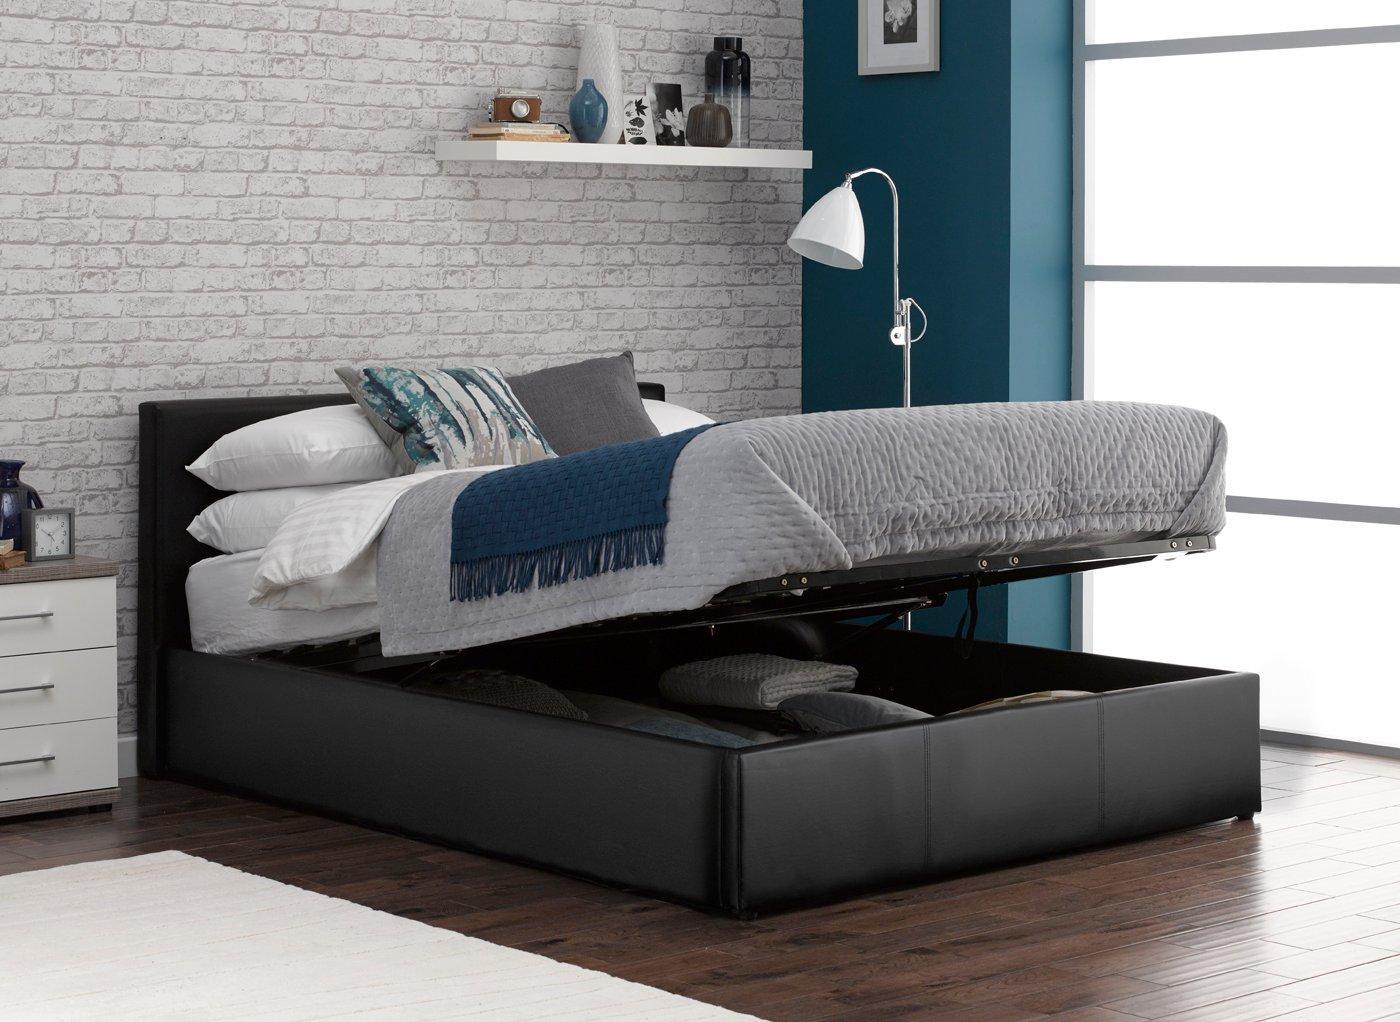 Yardley Upholstered Ottoman Bed Frame 4'6 Double BLACK